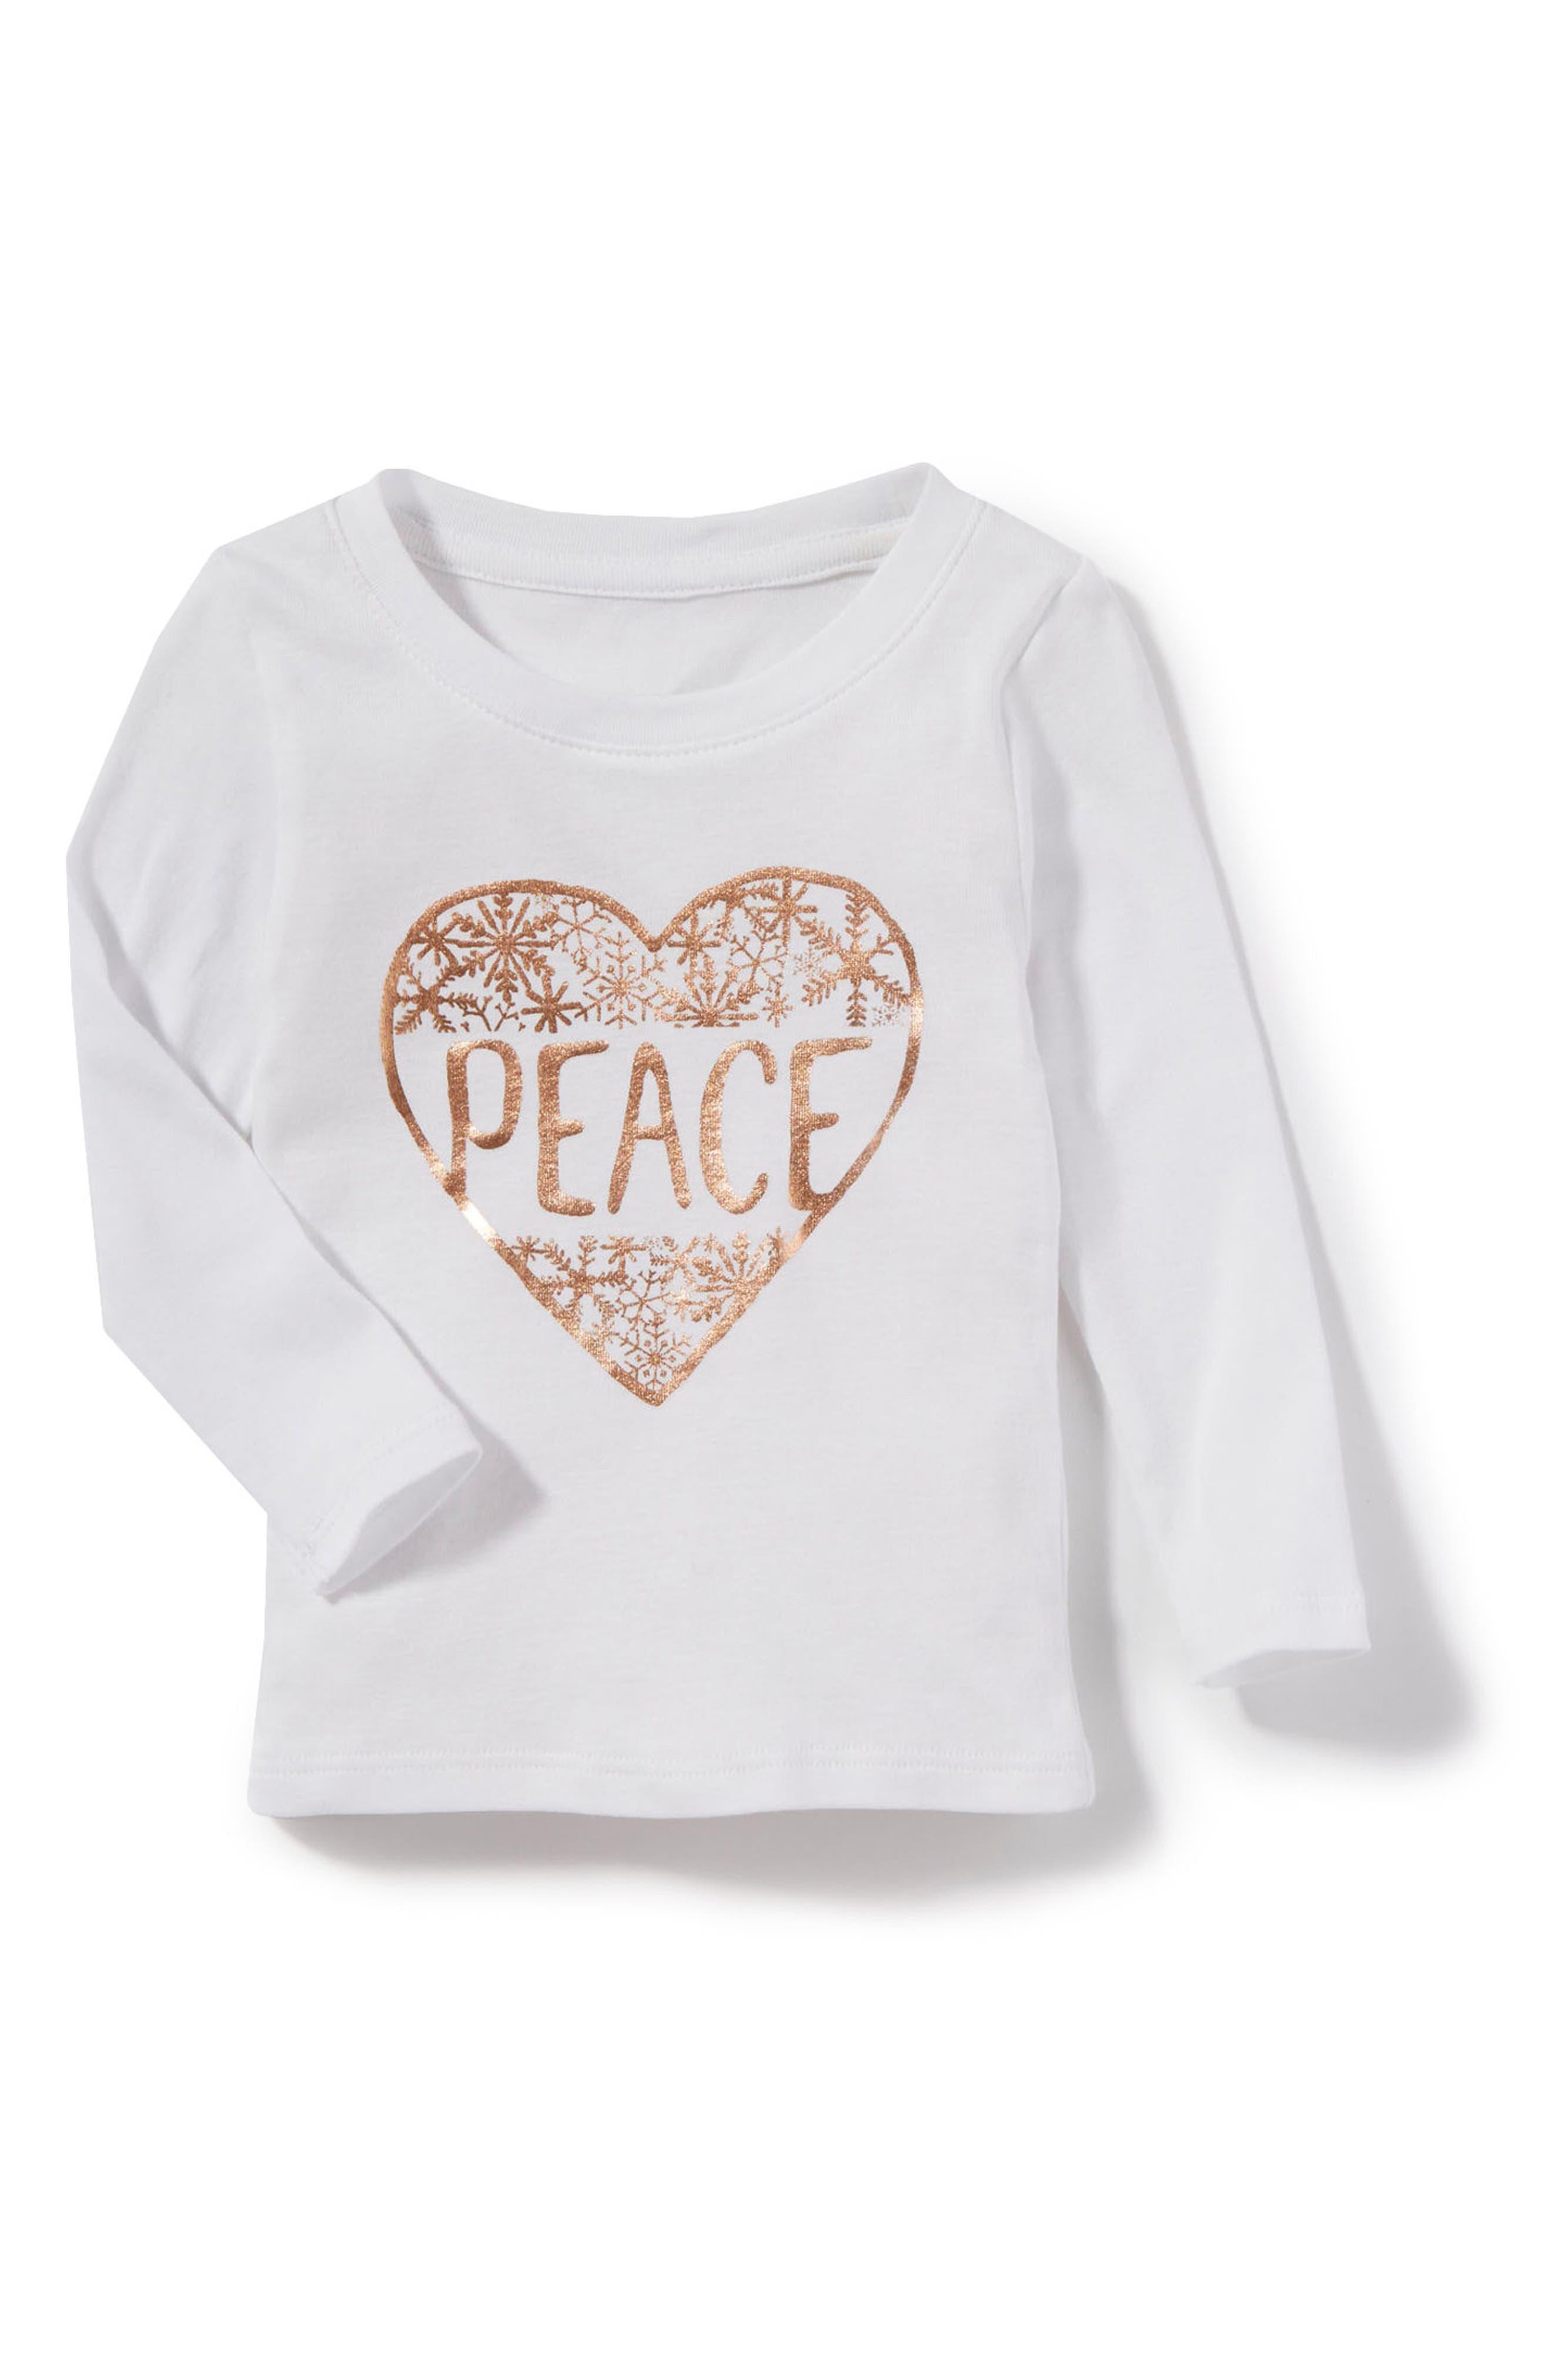 Peek Peace Graphic Tee,                         Main,                         color, White